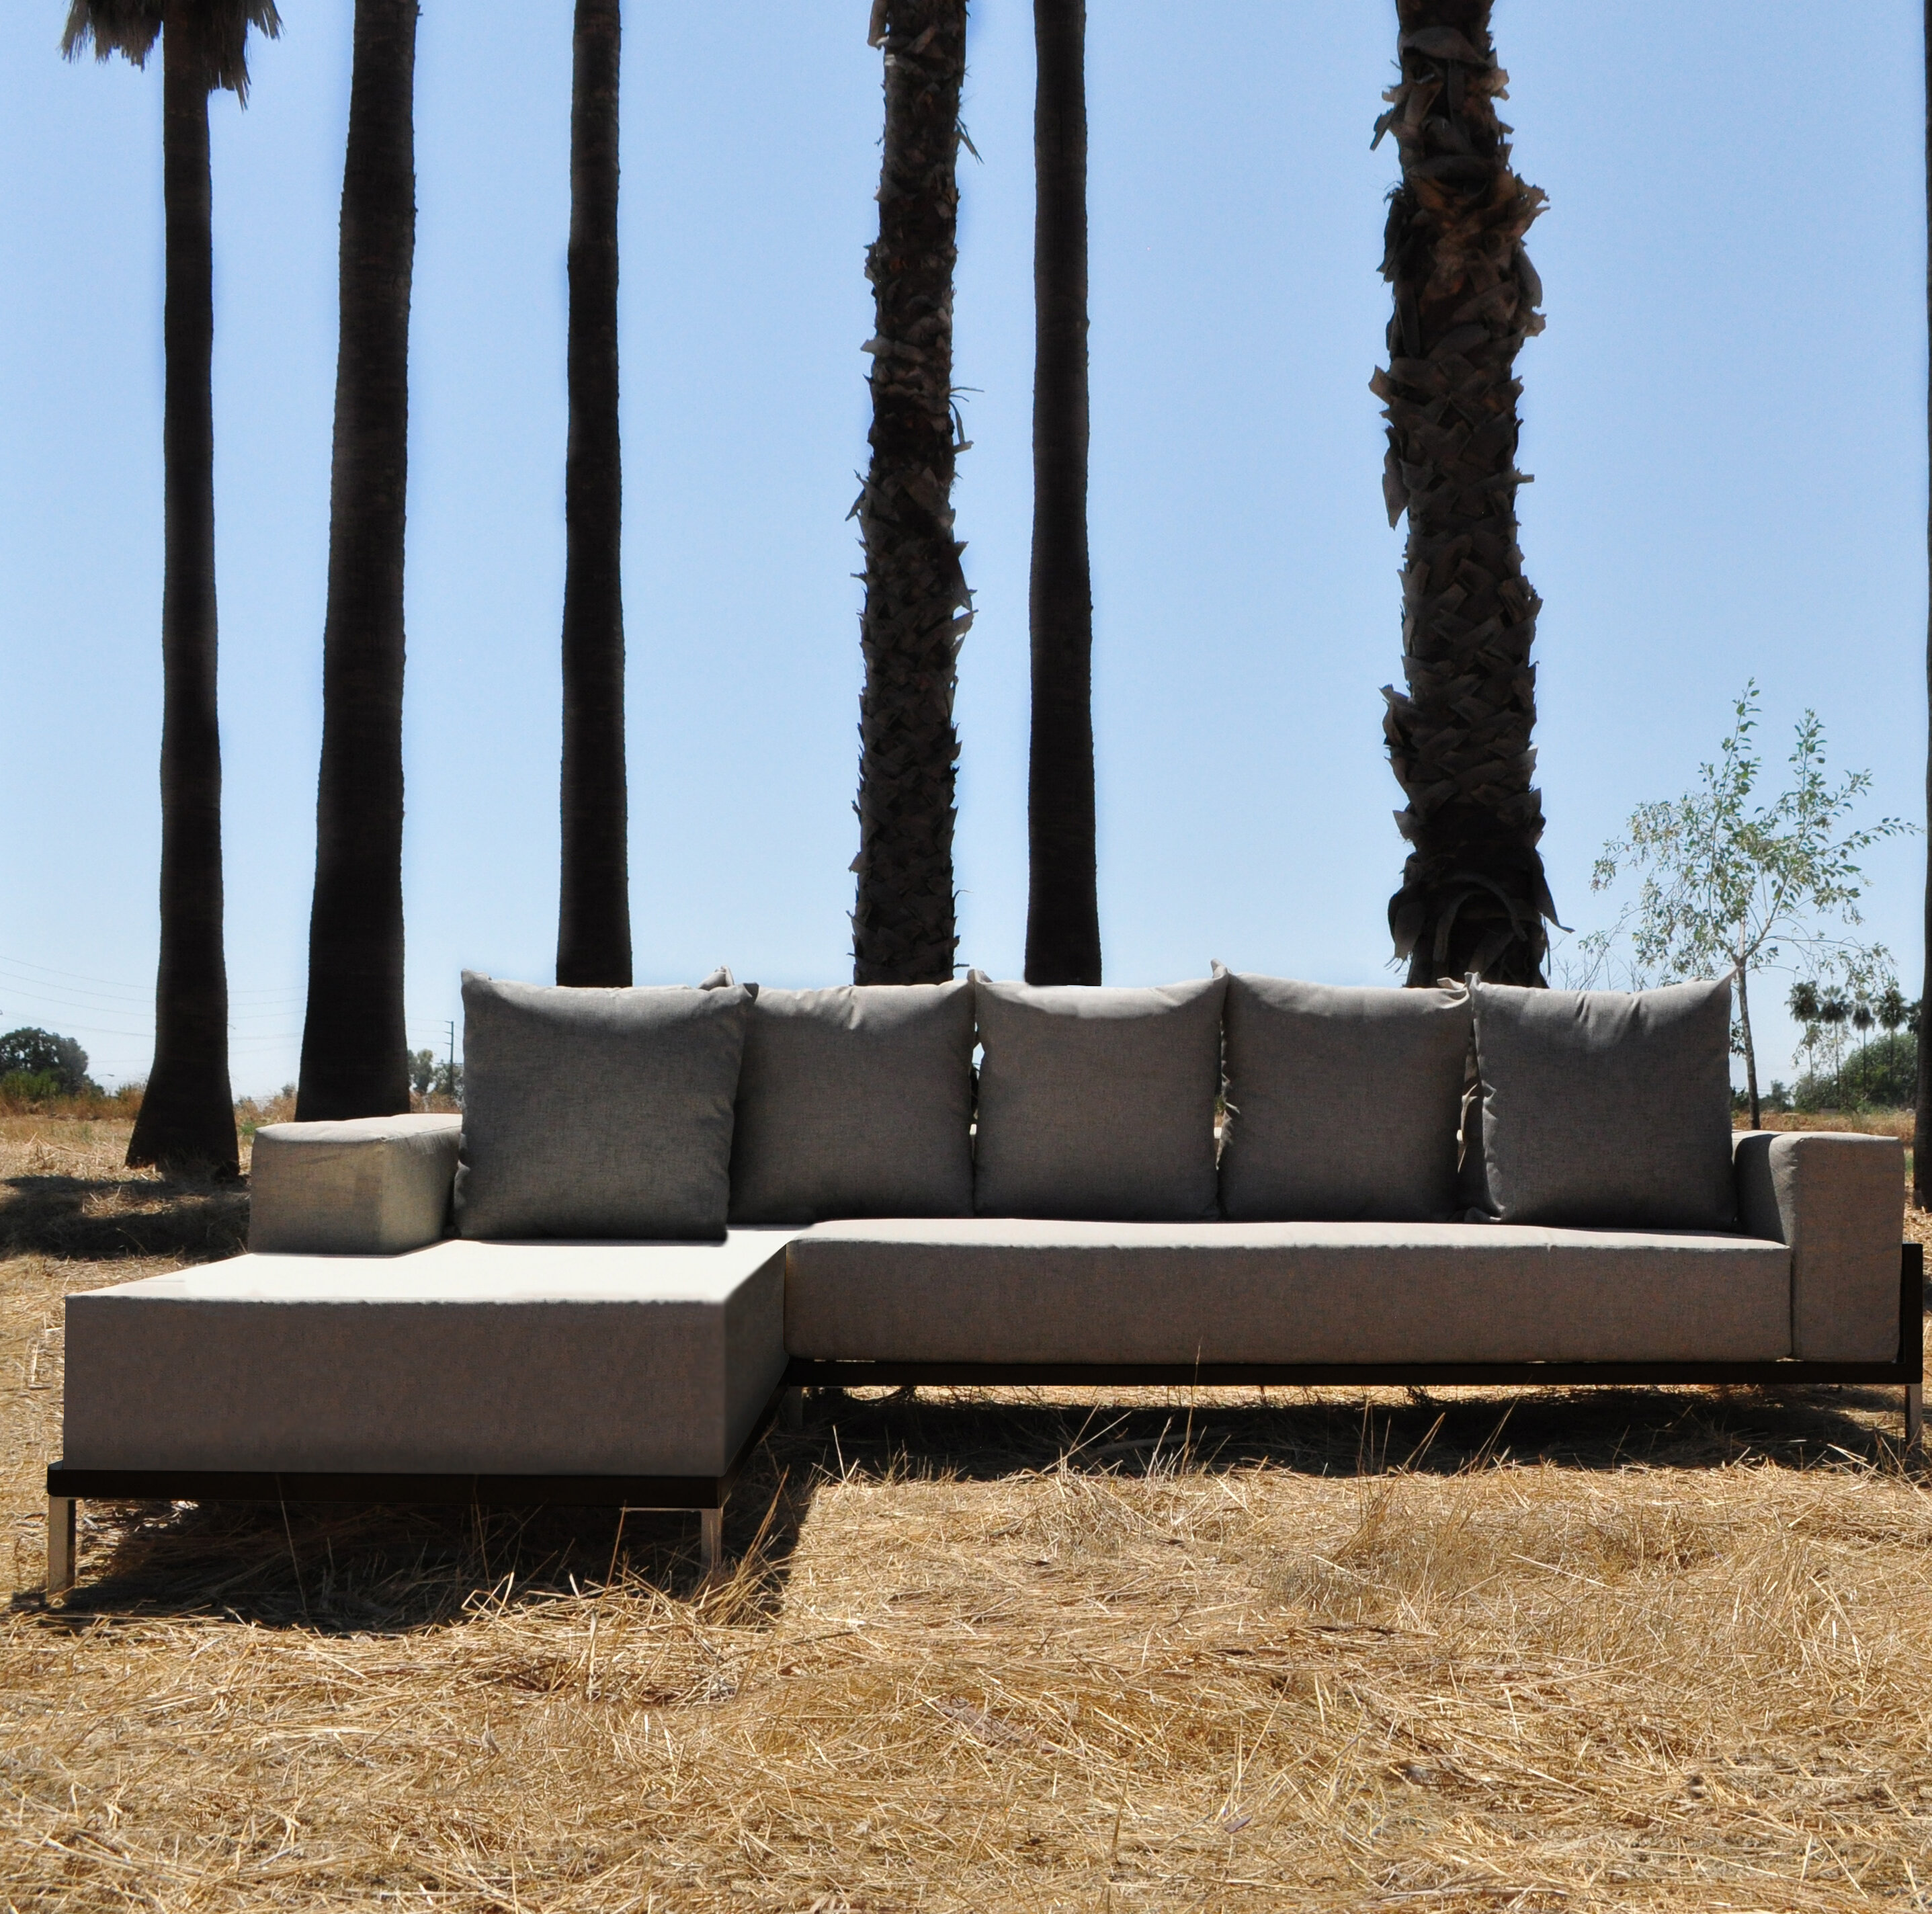 Orren Ellis Tilly 2 Piece Sectional Set with Cushions | Wayfair